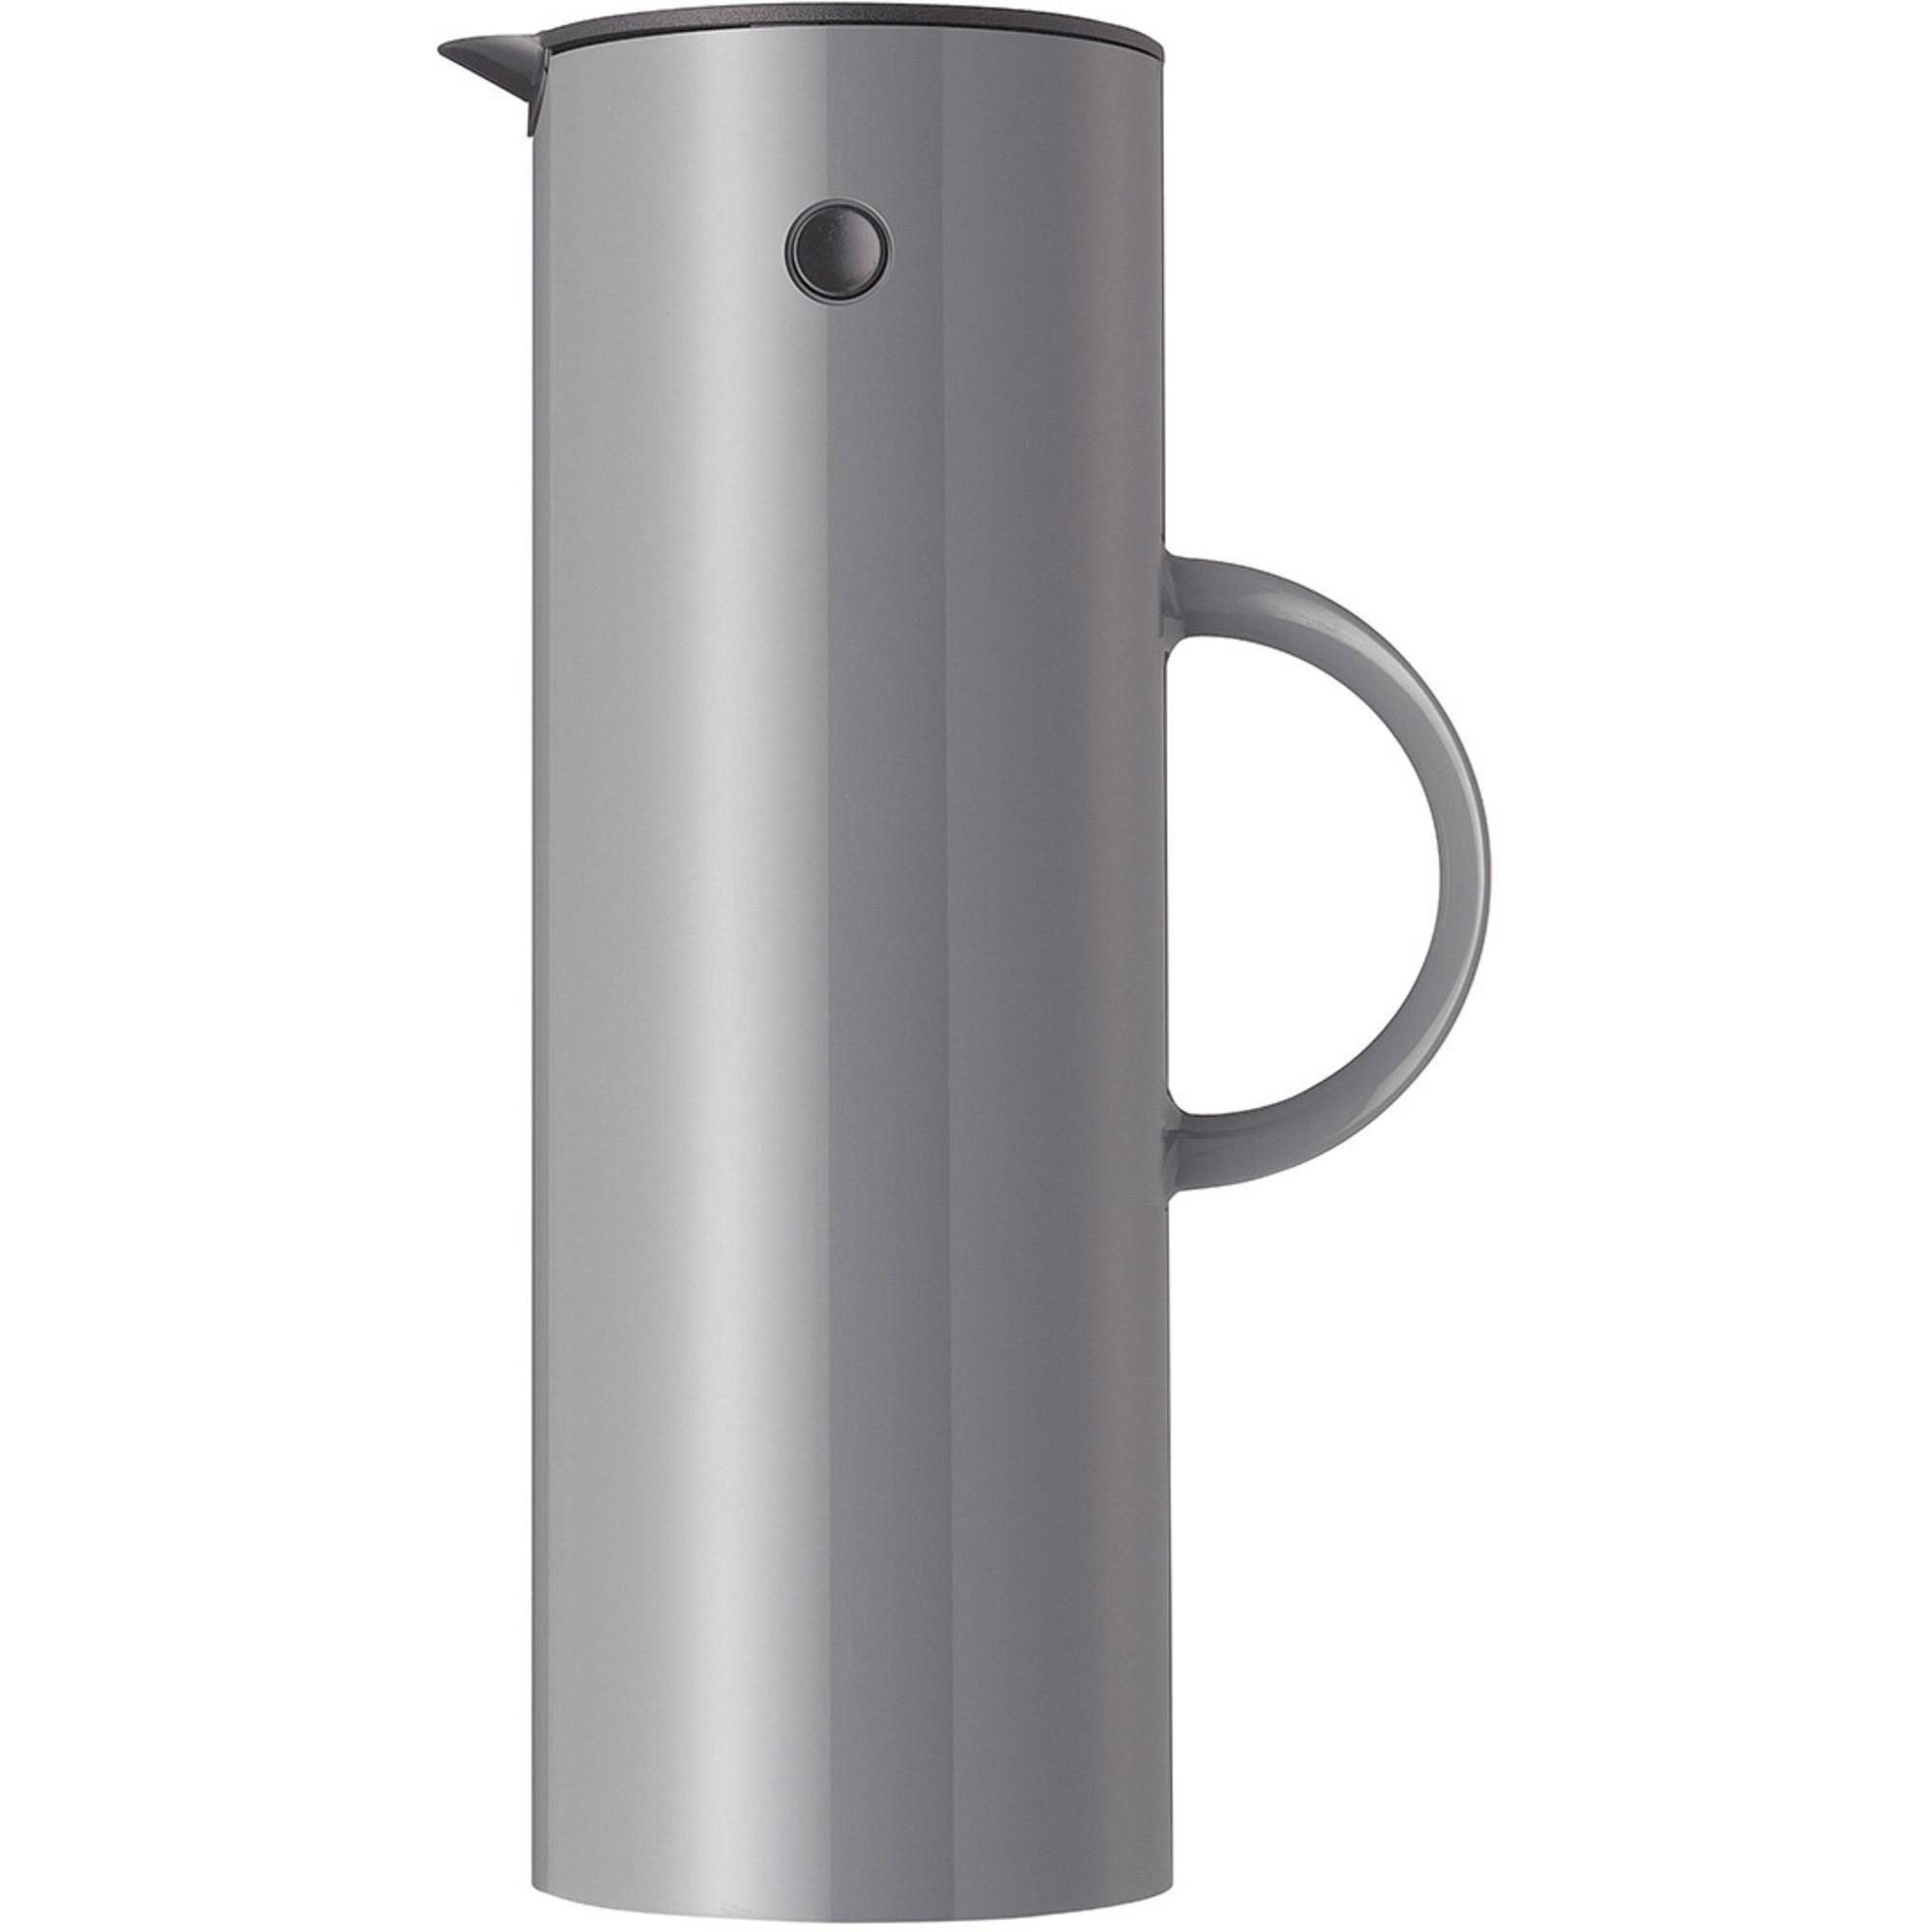 Stelton EM77 Termoskanna 1 liter – ABS Granit